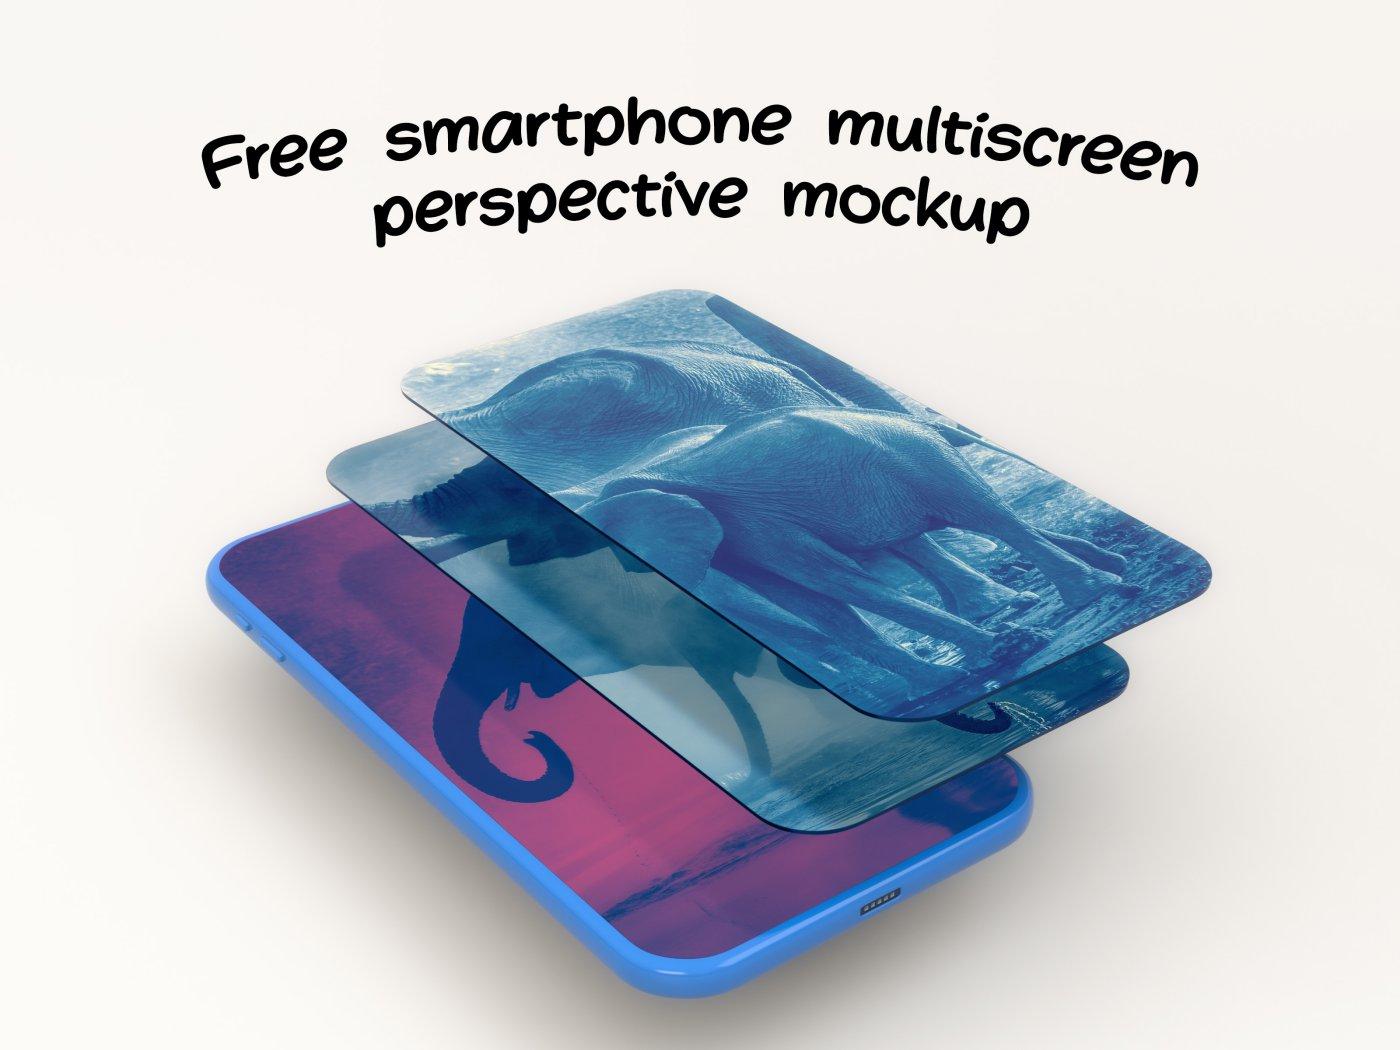 Free Smartphone Multiscreen Perspective Mockup